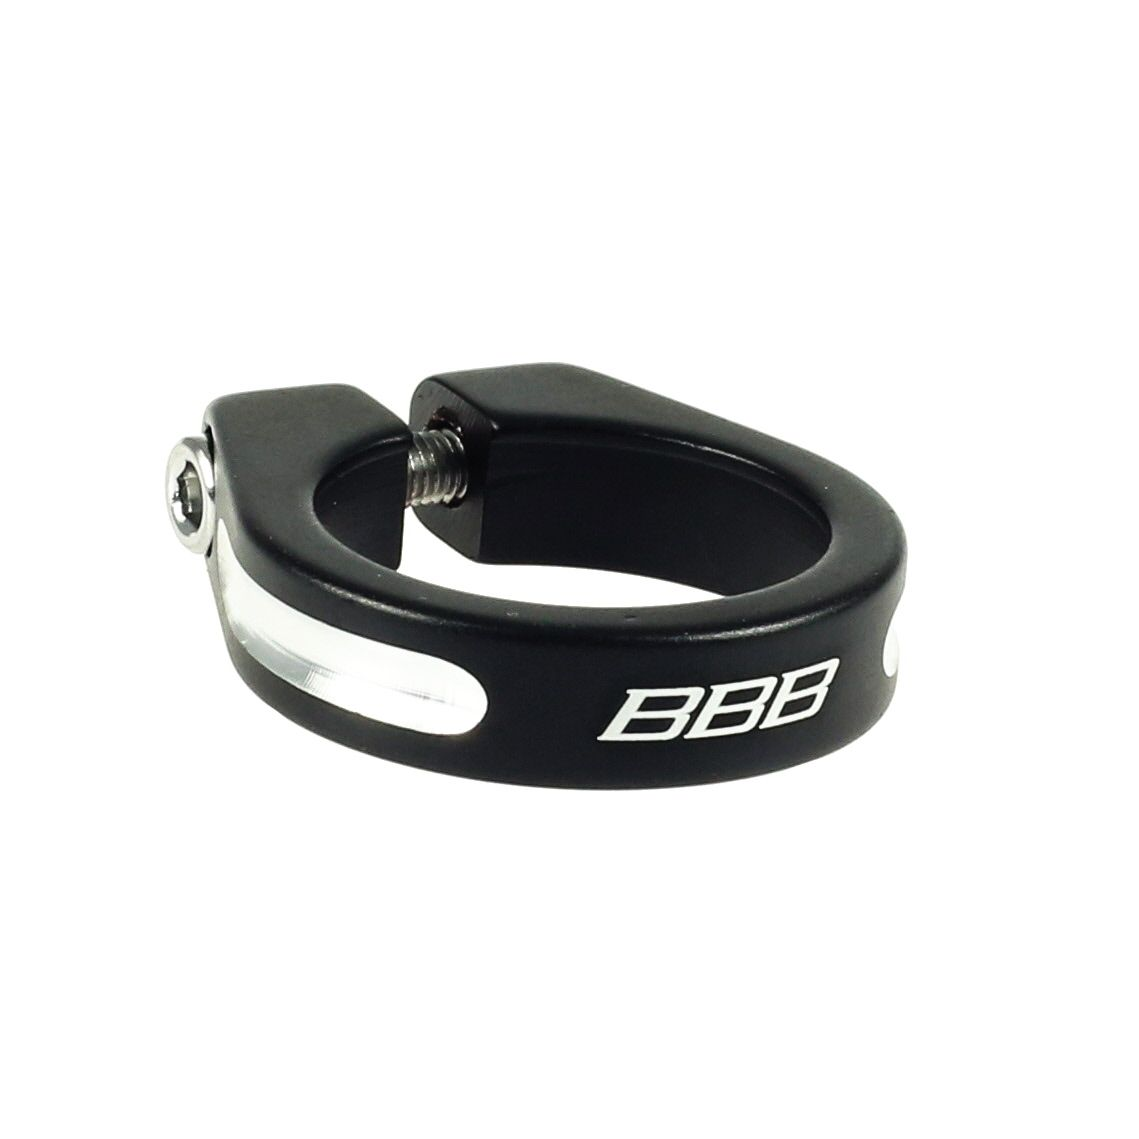 Collier de serrage BBB TheStrangler 34,9 (noir) - BSP-80